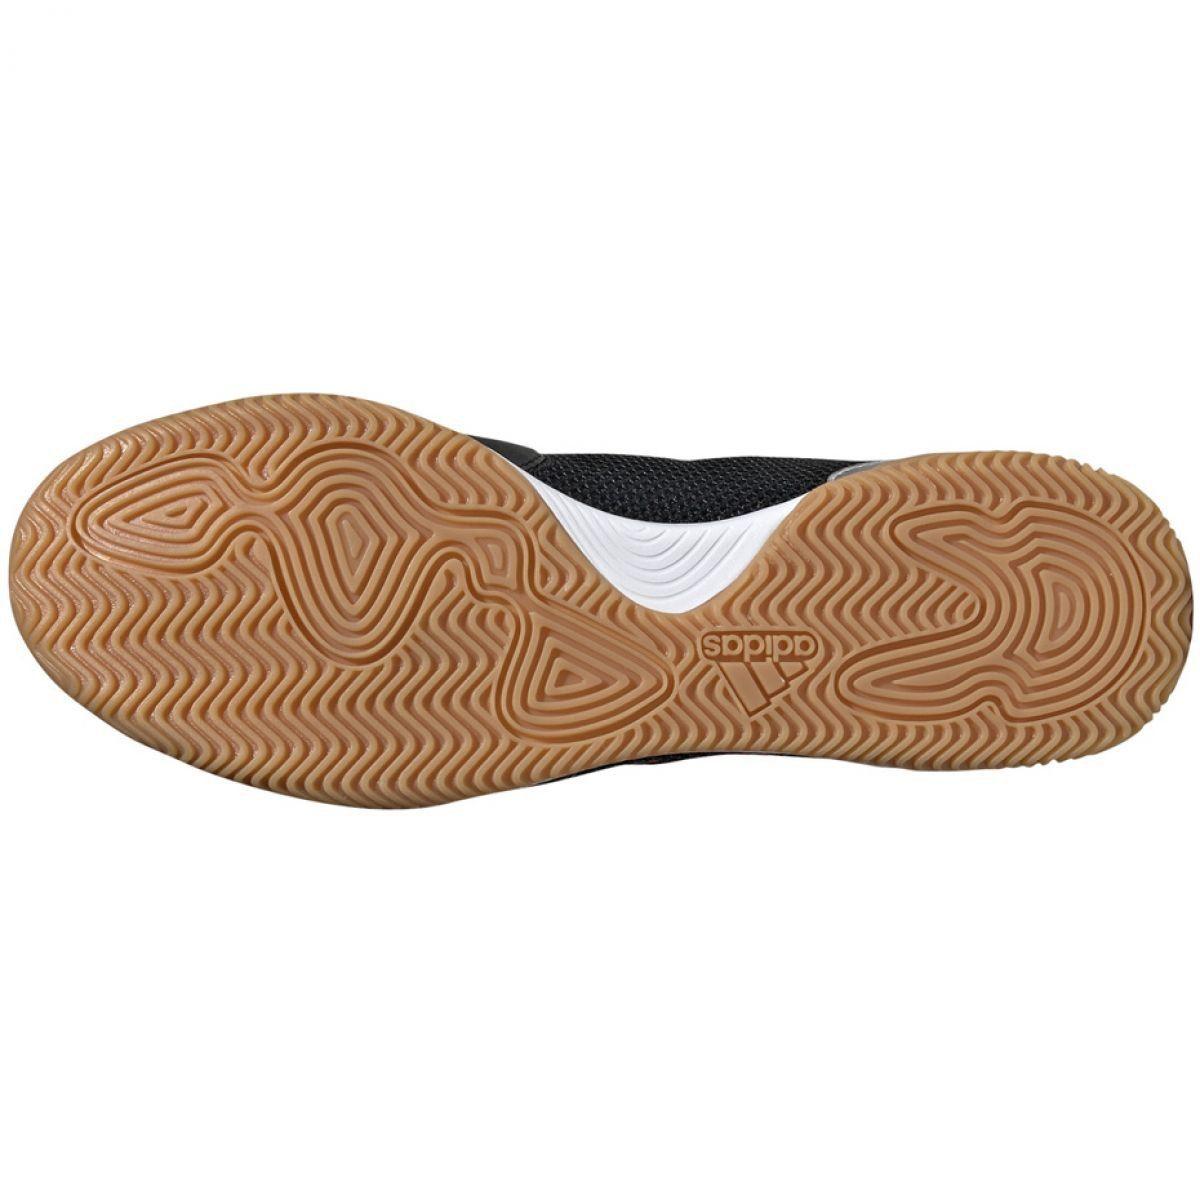 Halowe Pilka Nozna Sport Adidas Buty Pilkarskie Adidas Copa 19 3 In Sala M F35502 Football Boots Football Shoes Black Boots